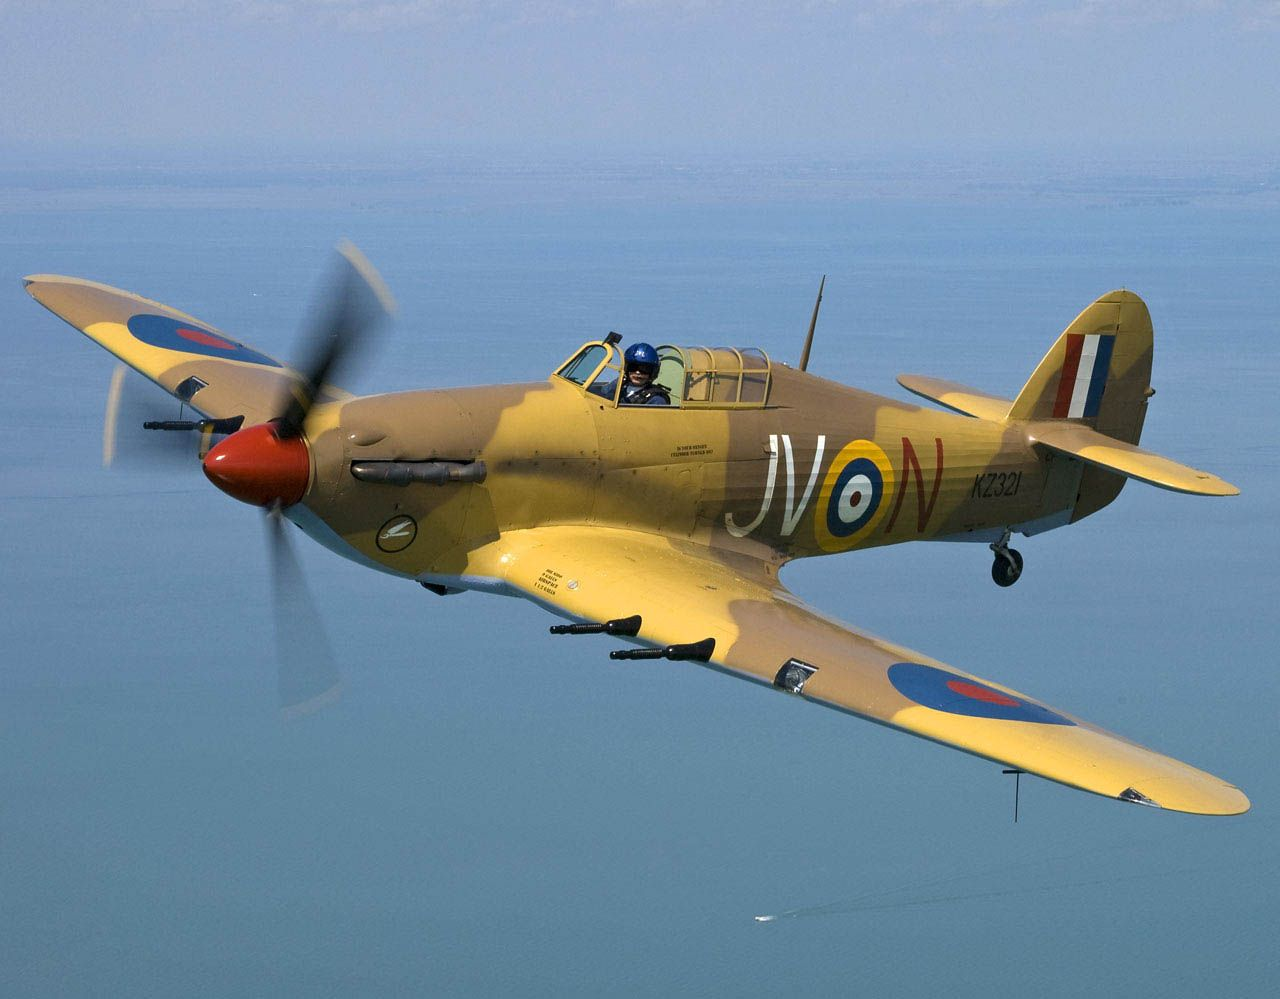 Hawker Hurricane Mk1 Hawker Hurricane Wwii Aircraft Vintage Aircraft